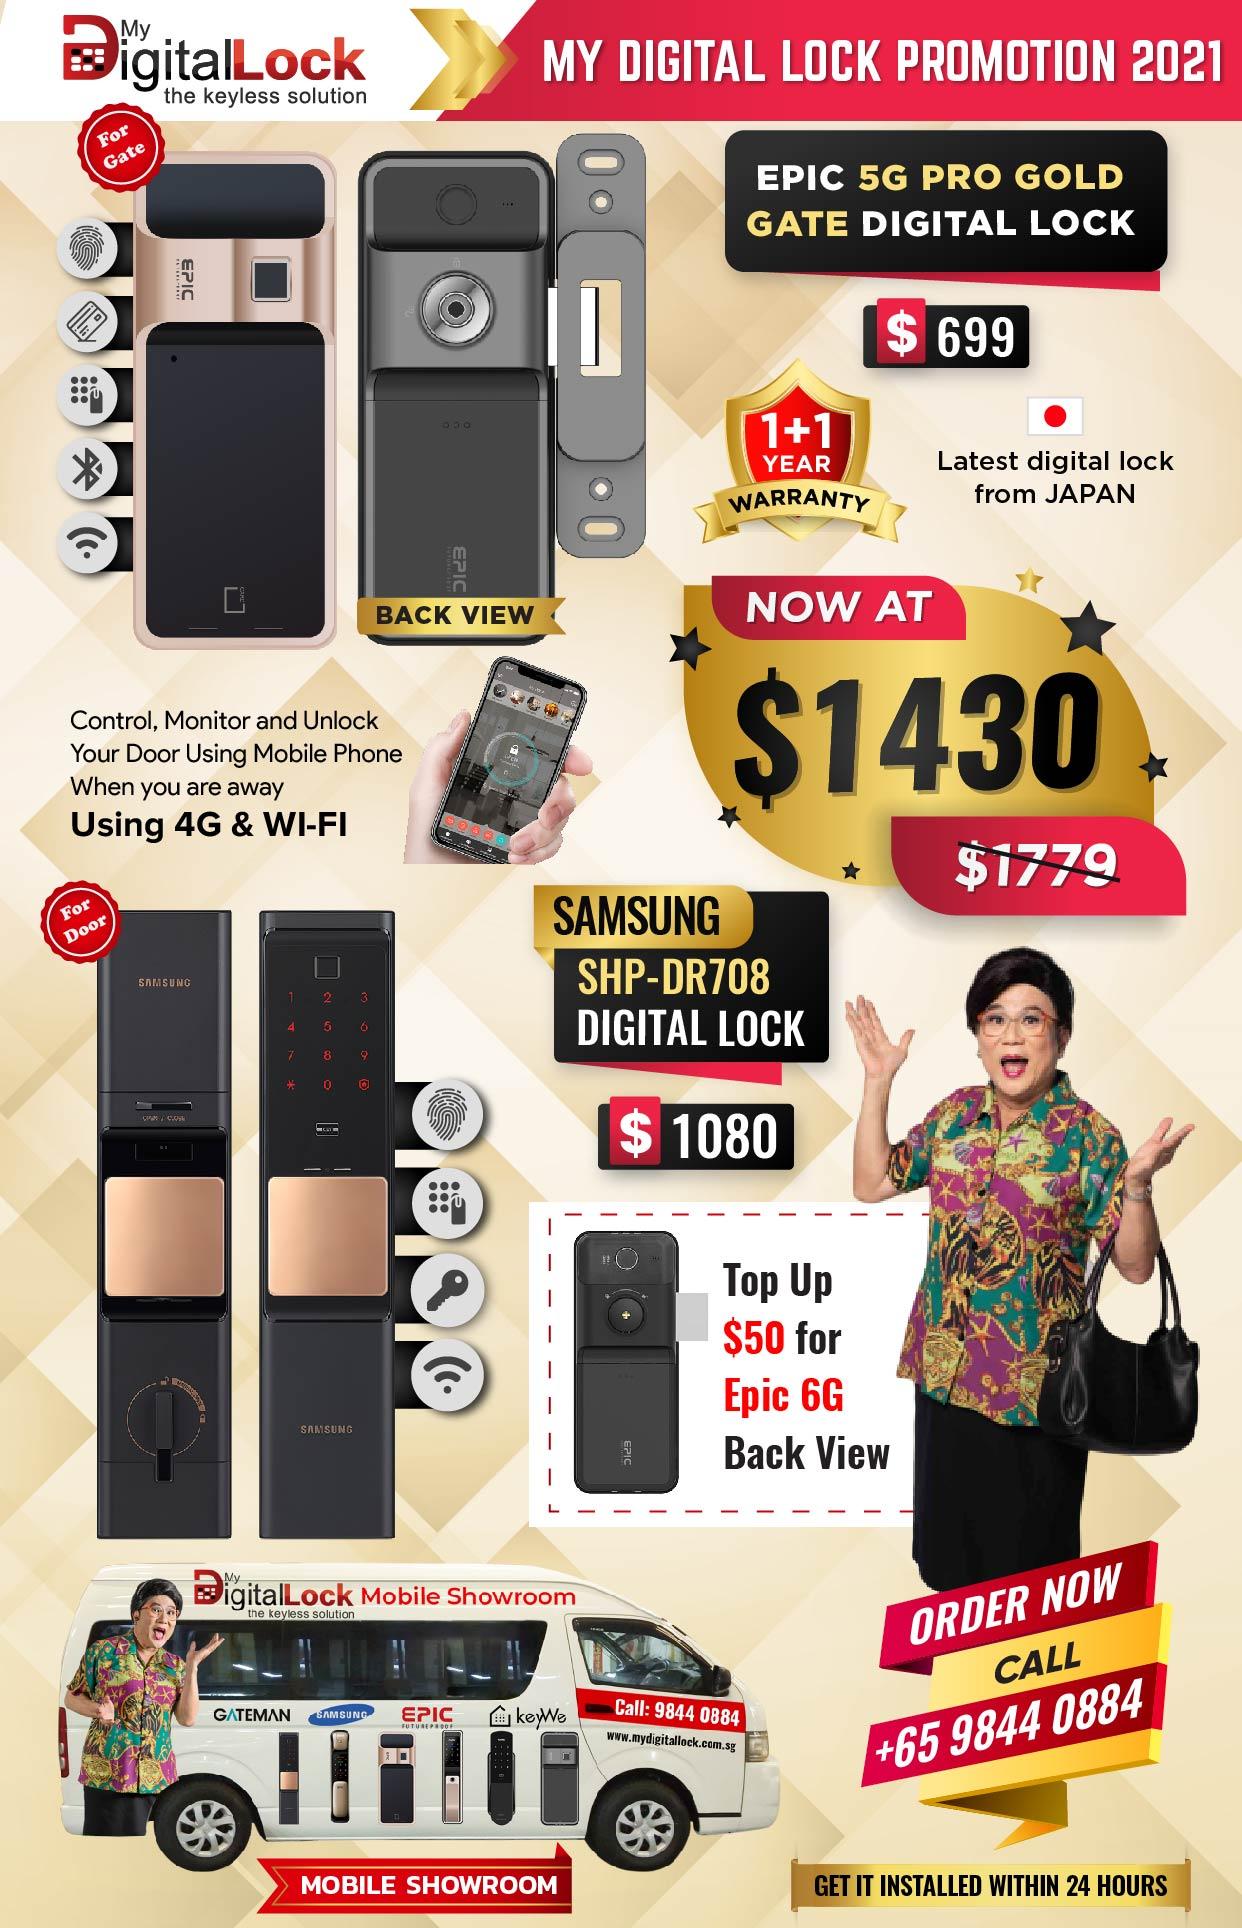 Samsung-DP-609-Gold-Push-Pull-Digital Lock